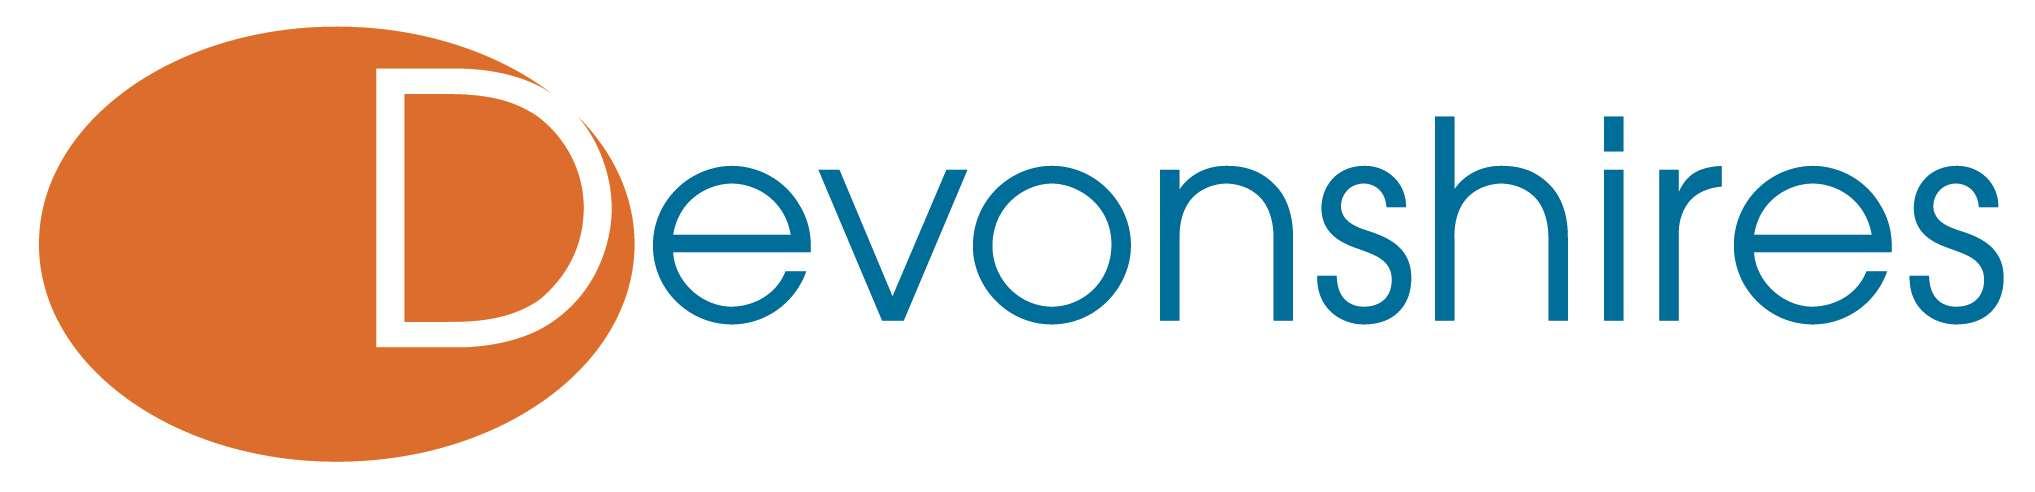 Devonshires Logo.jpg